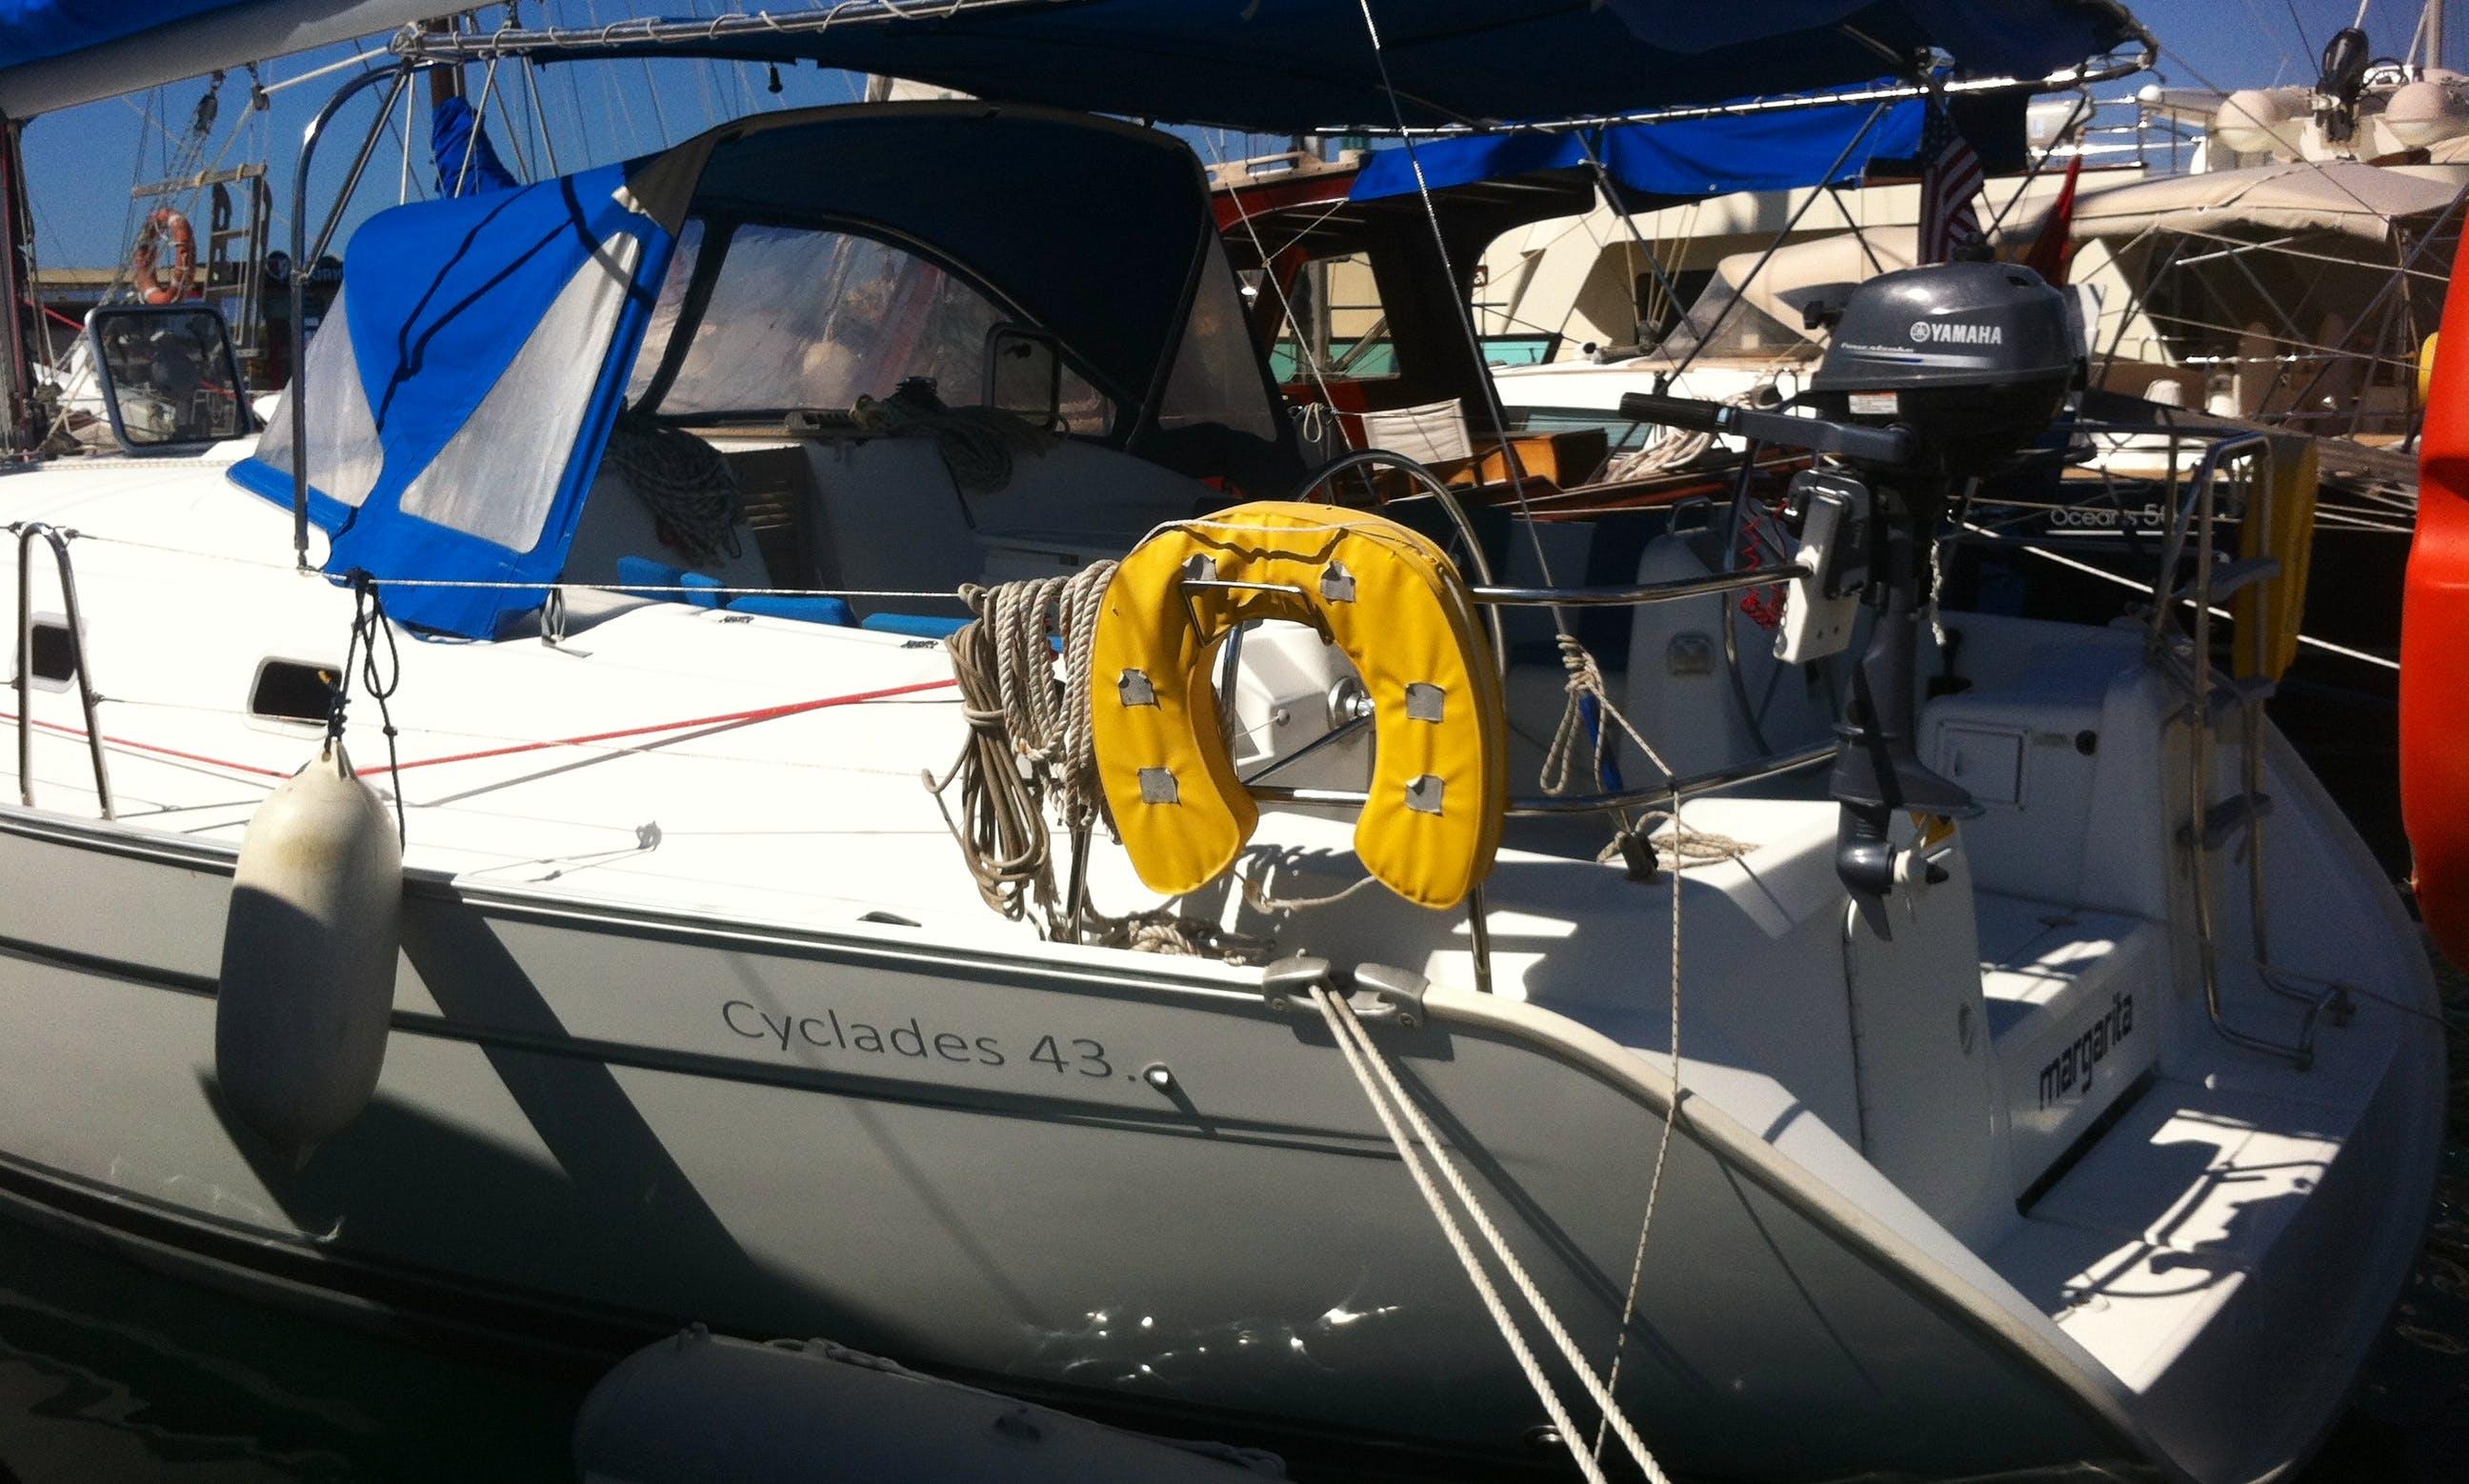 Beneteau Cyclades 43 Cruising Monohul Bareboat Charter in Turgutreis, Turkey